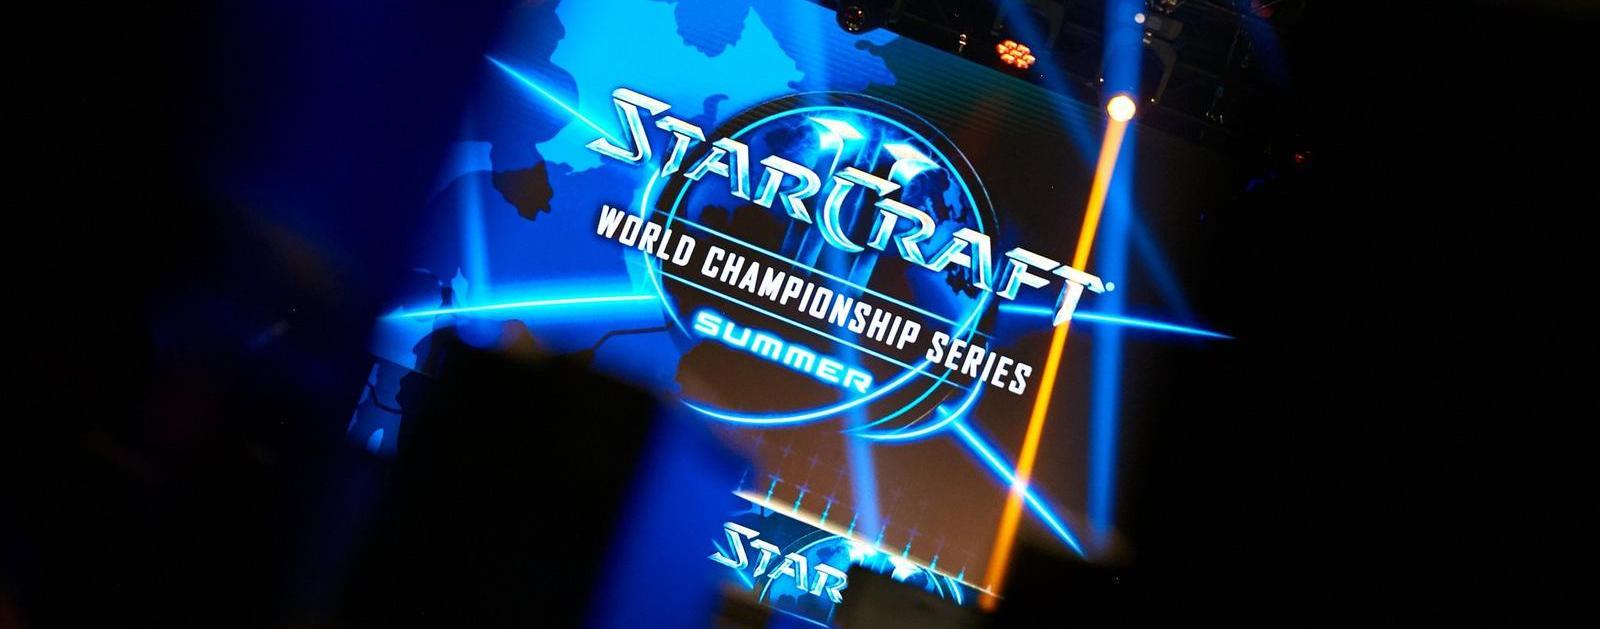 Starcraft II, l'italiano Reynor principe di Kiev: è trionfo al WCS Summer